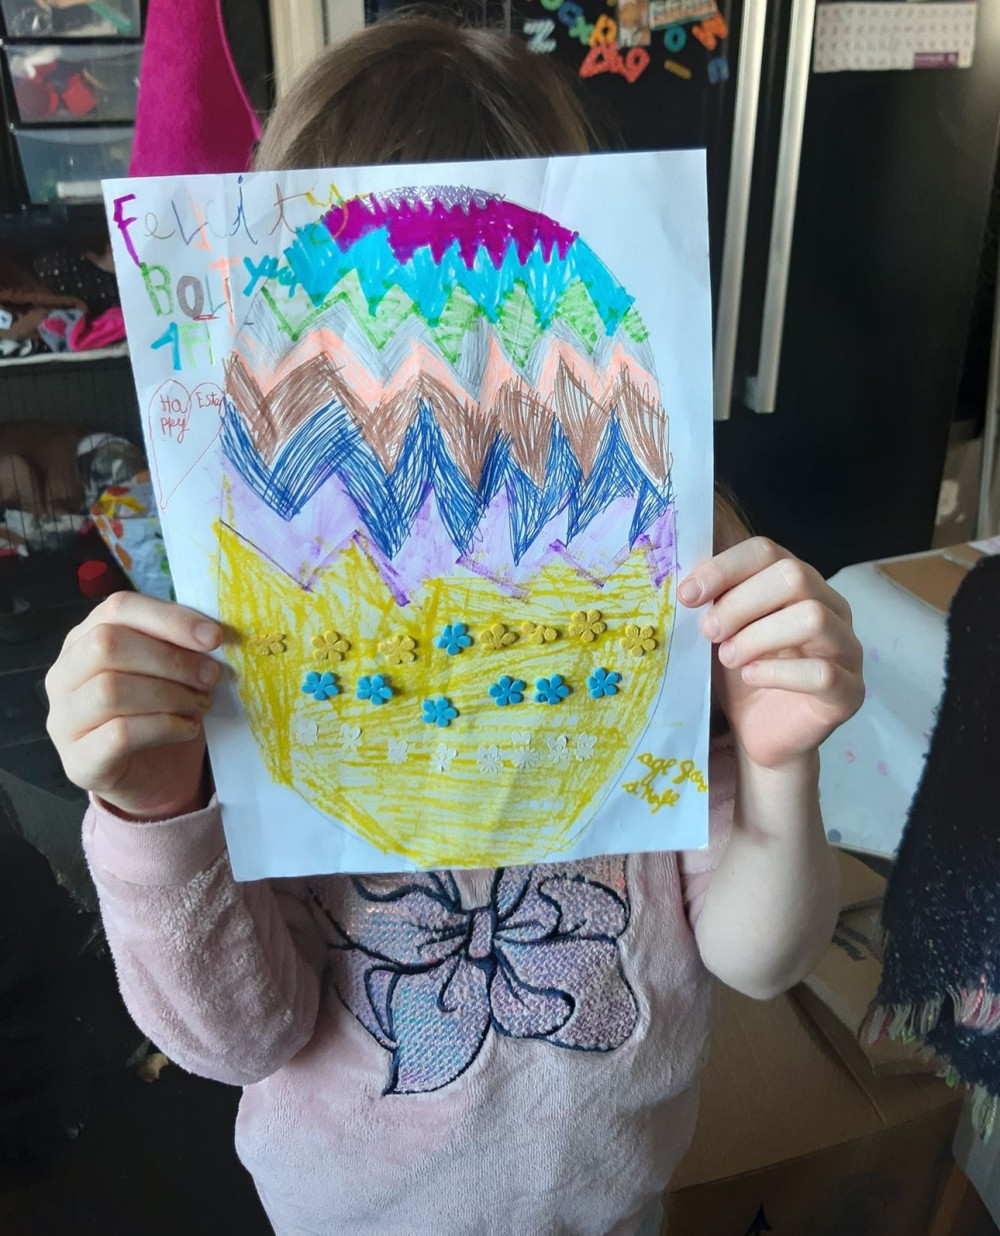 Felicity Bolt's egg (age 8)